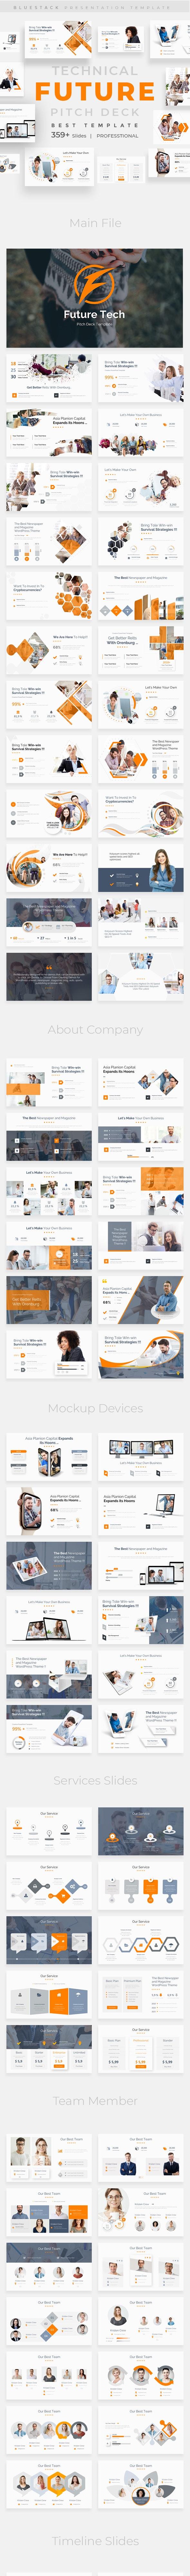 Future Tech Pitch Deck Powerpoint Template - Business PowerPoint Templates